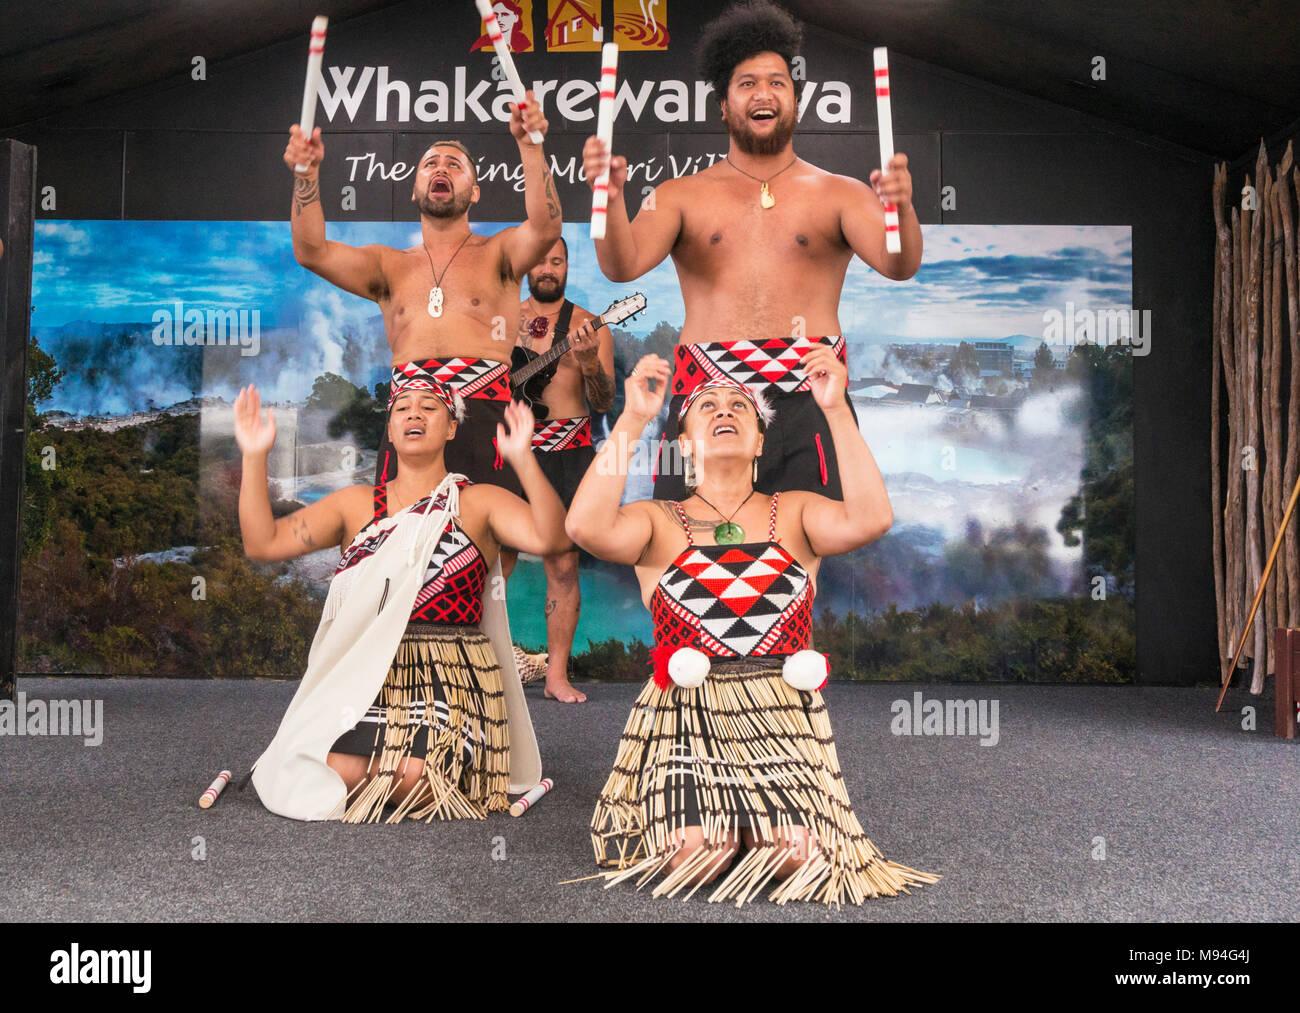 Neuseeland rotorua Neuseeland whakarewarewa rotorua Maori Kultur Entertainment Show mit vier Tänzern der Maori neuseeland Nordinsel Neuseeland Ozeanien Stockfoto